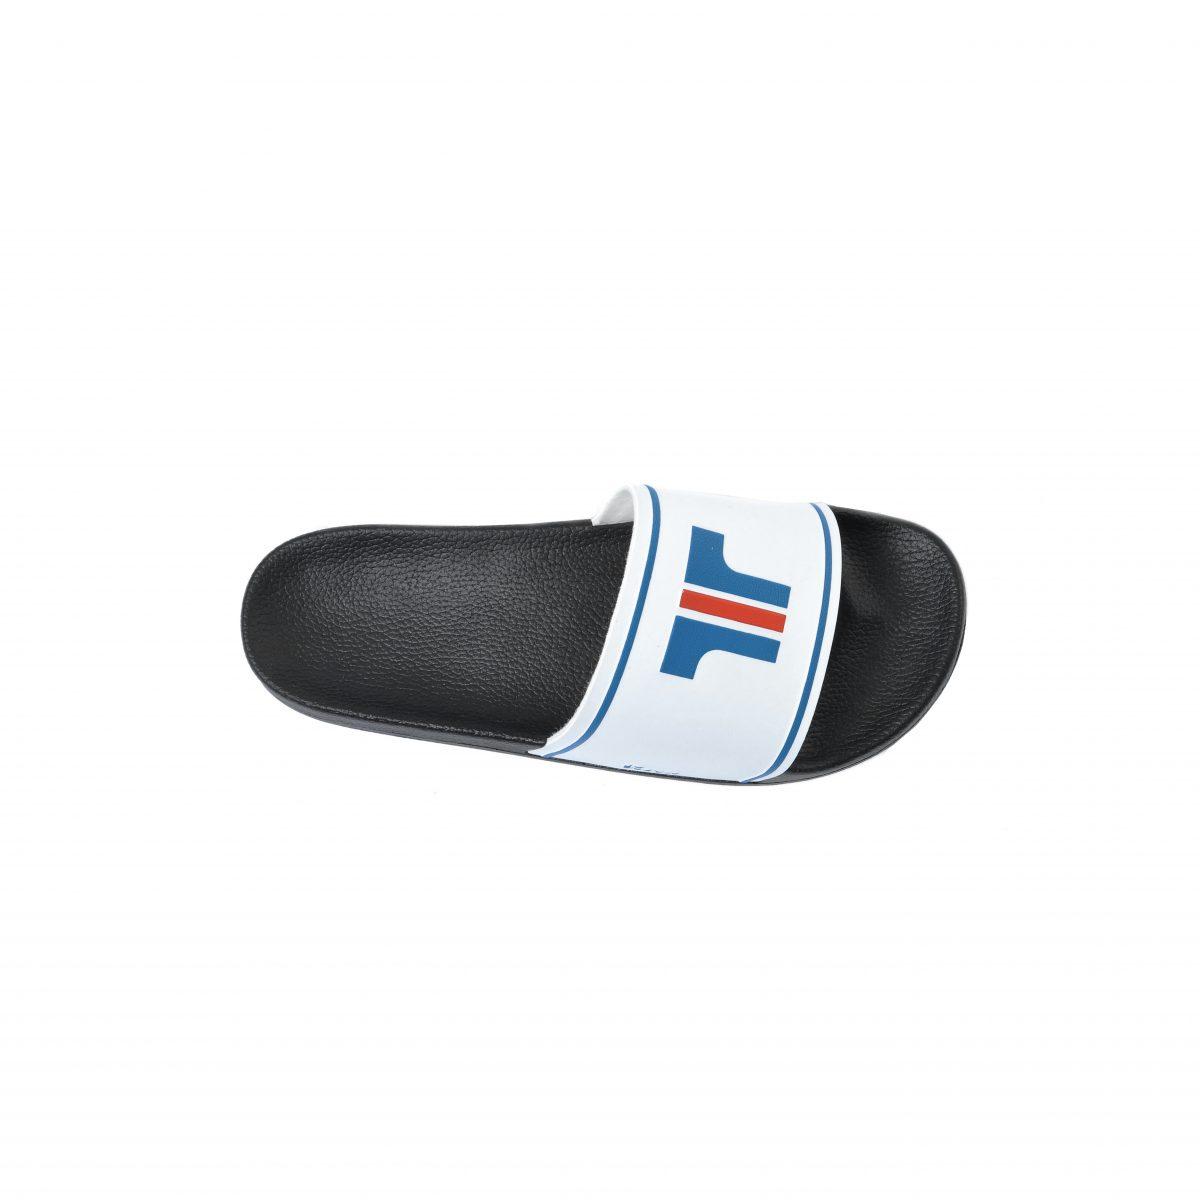 Tisza shoes - Sliders - Black-classic